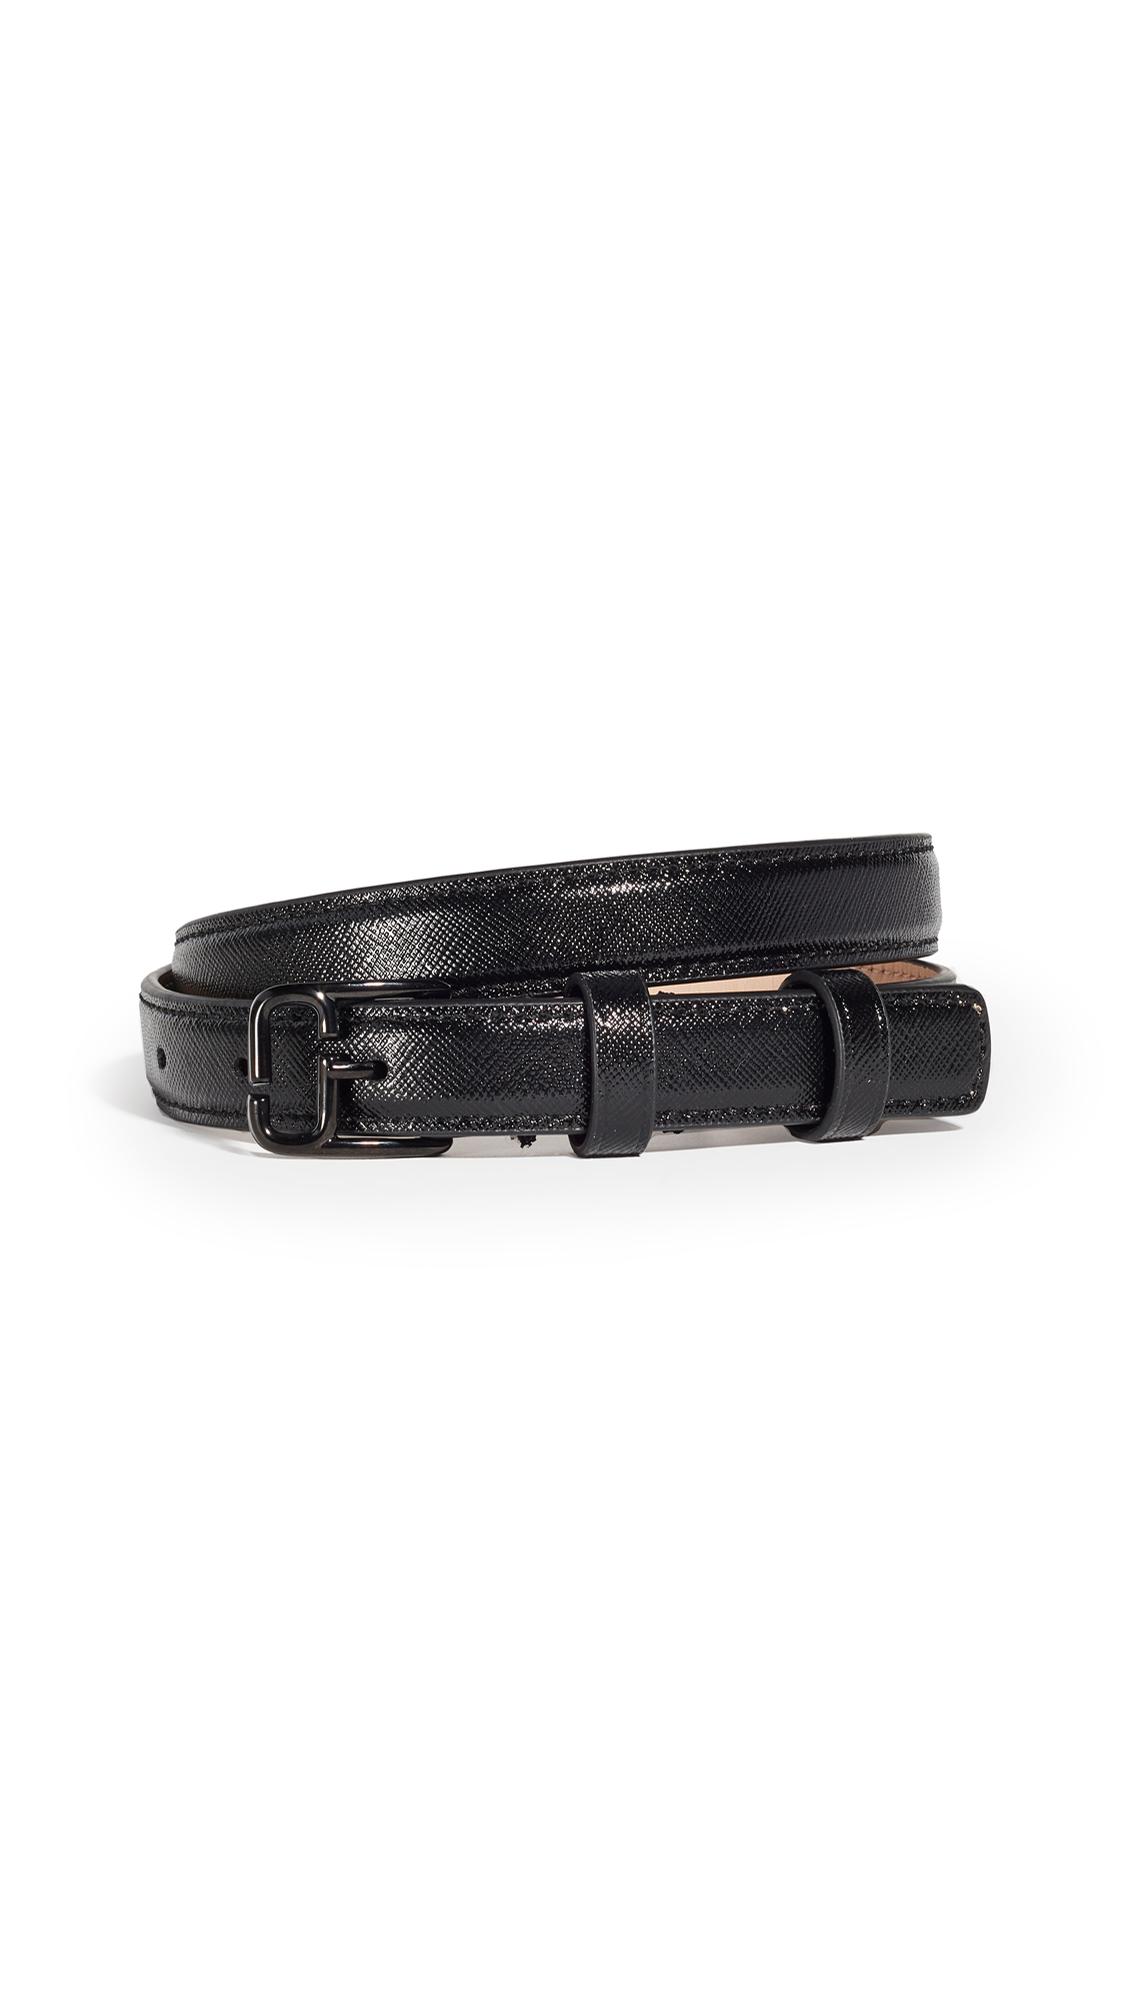 The Marc Jacobs 2cm Wide Belt